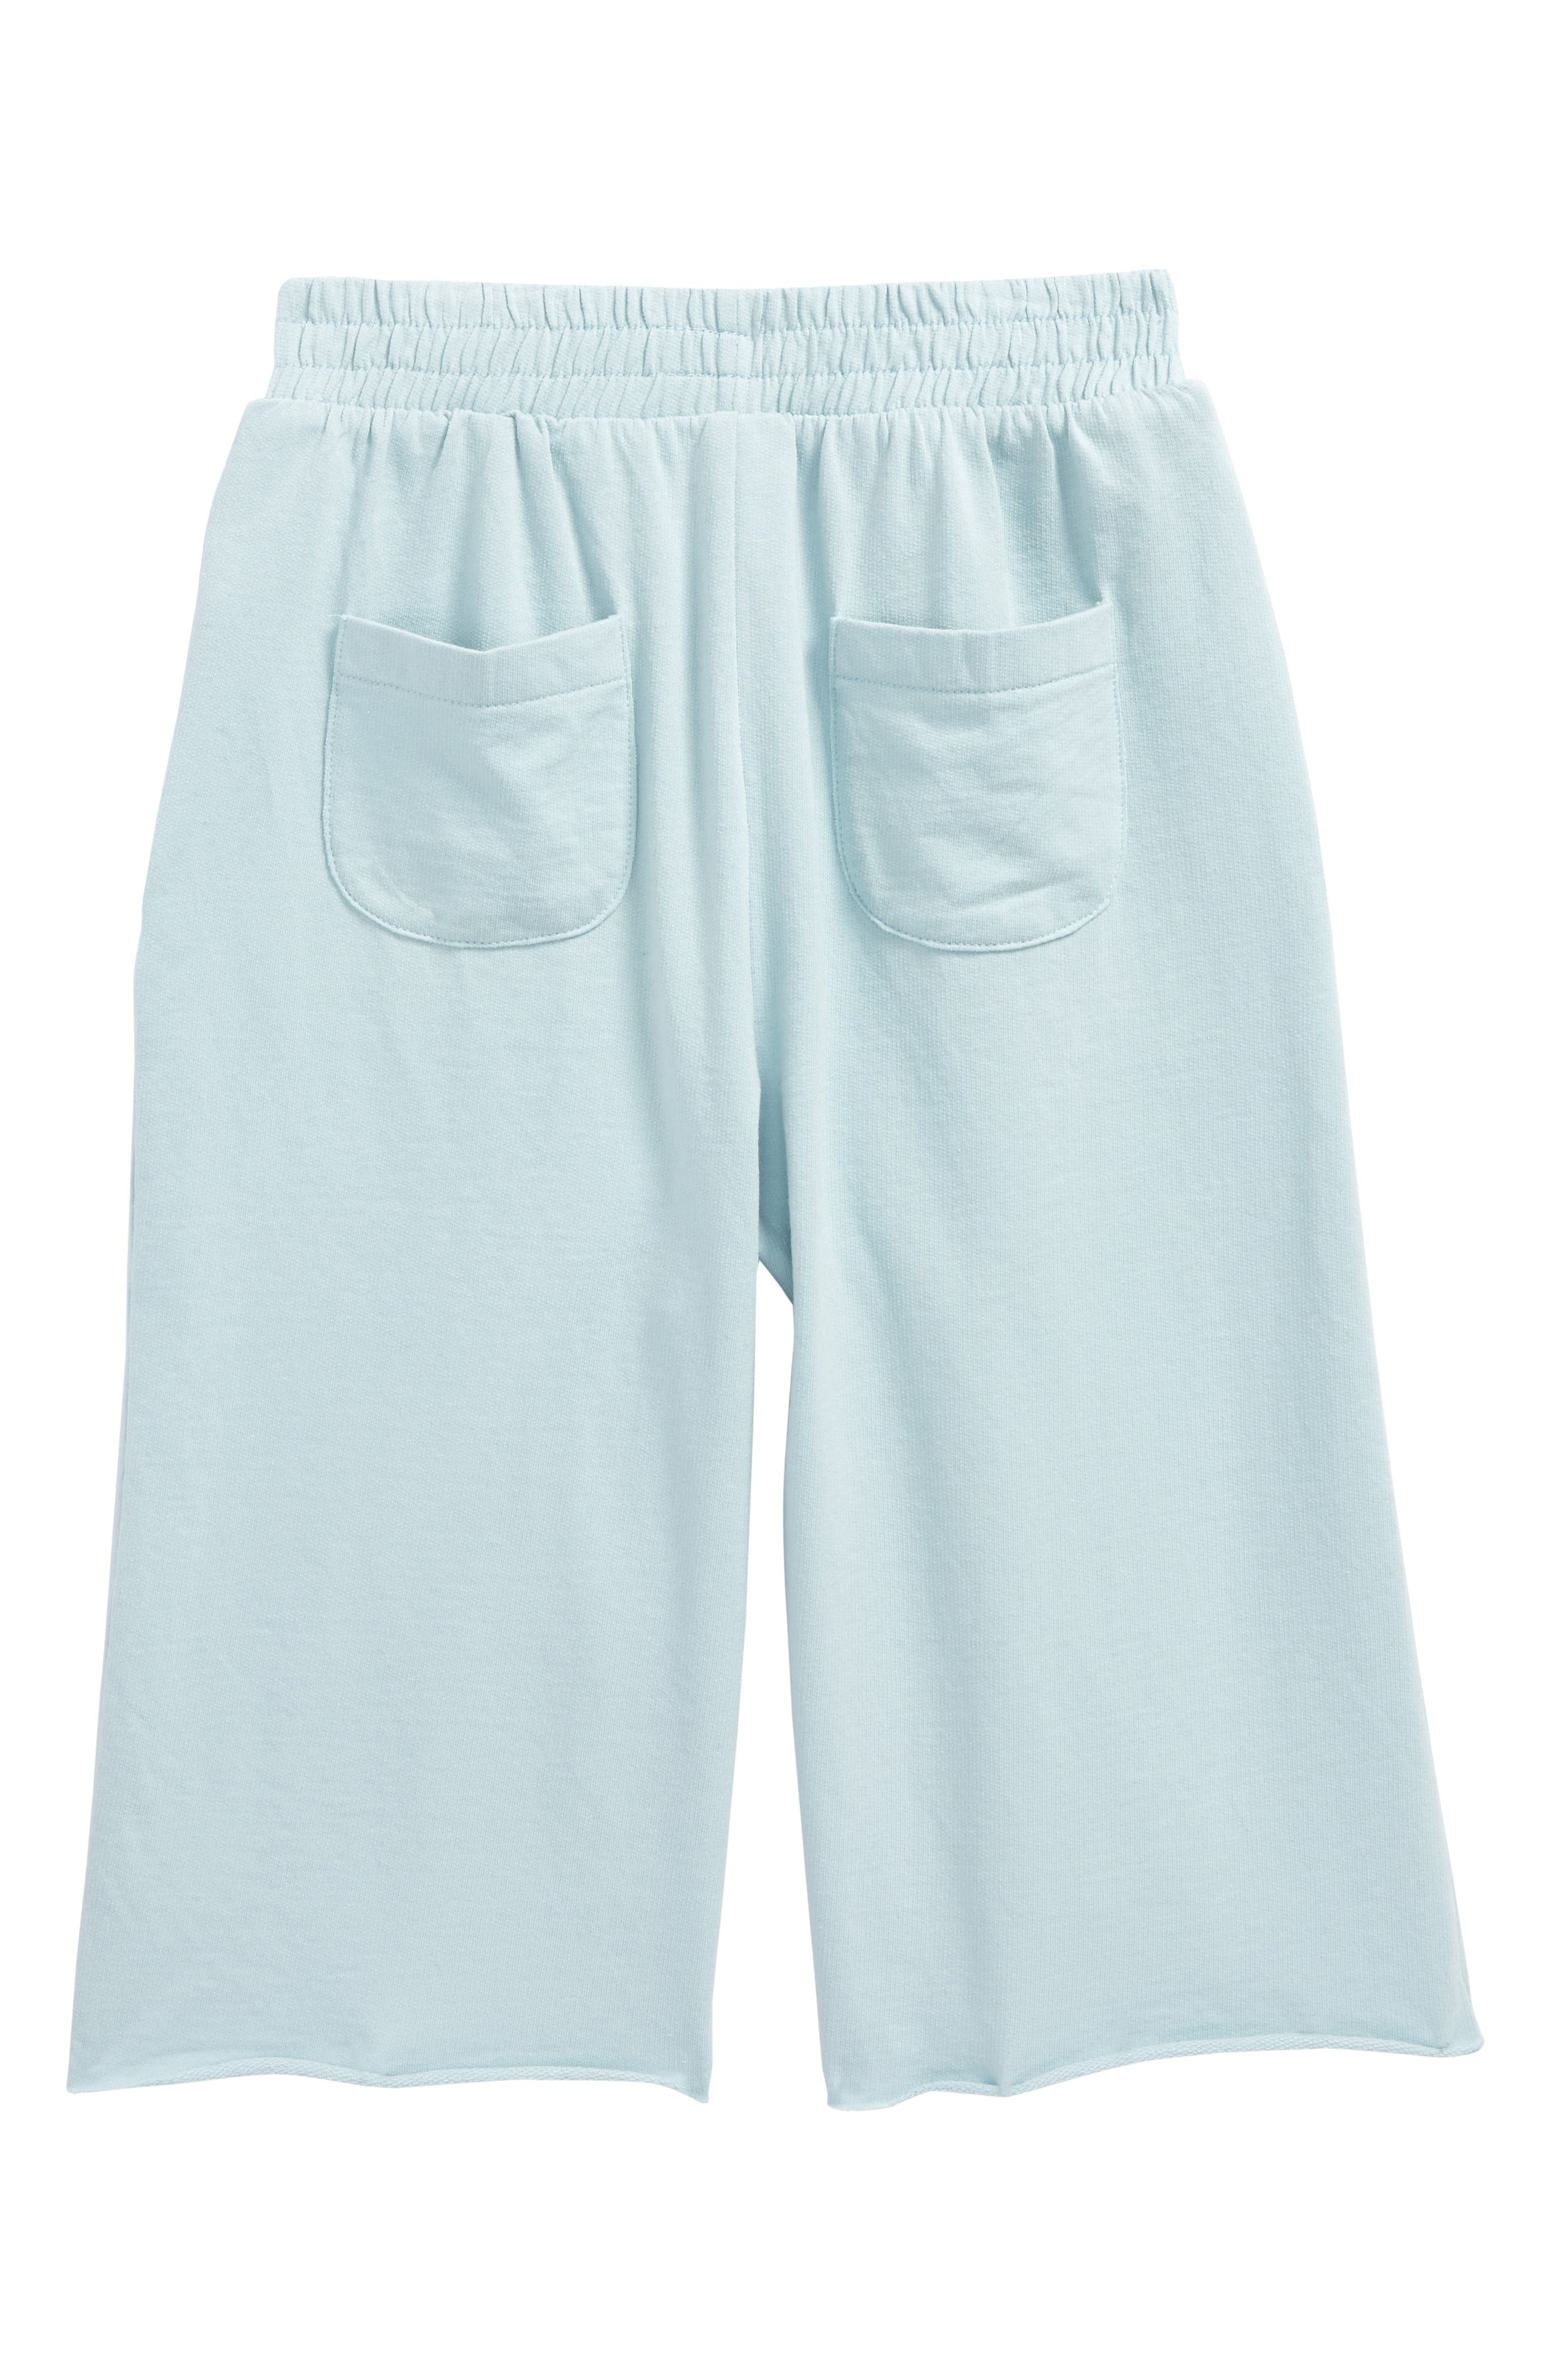 Wide Leg Sweatpants,                             Alternate thumbnail 2, color,                             Blue Sterling